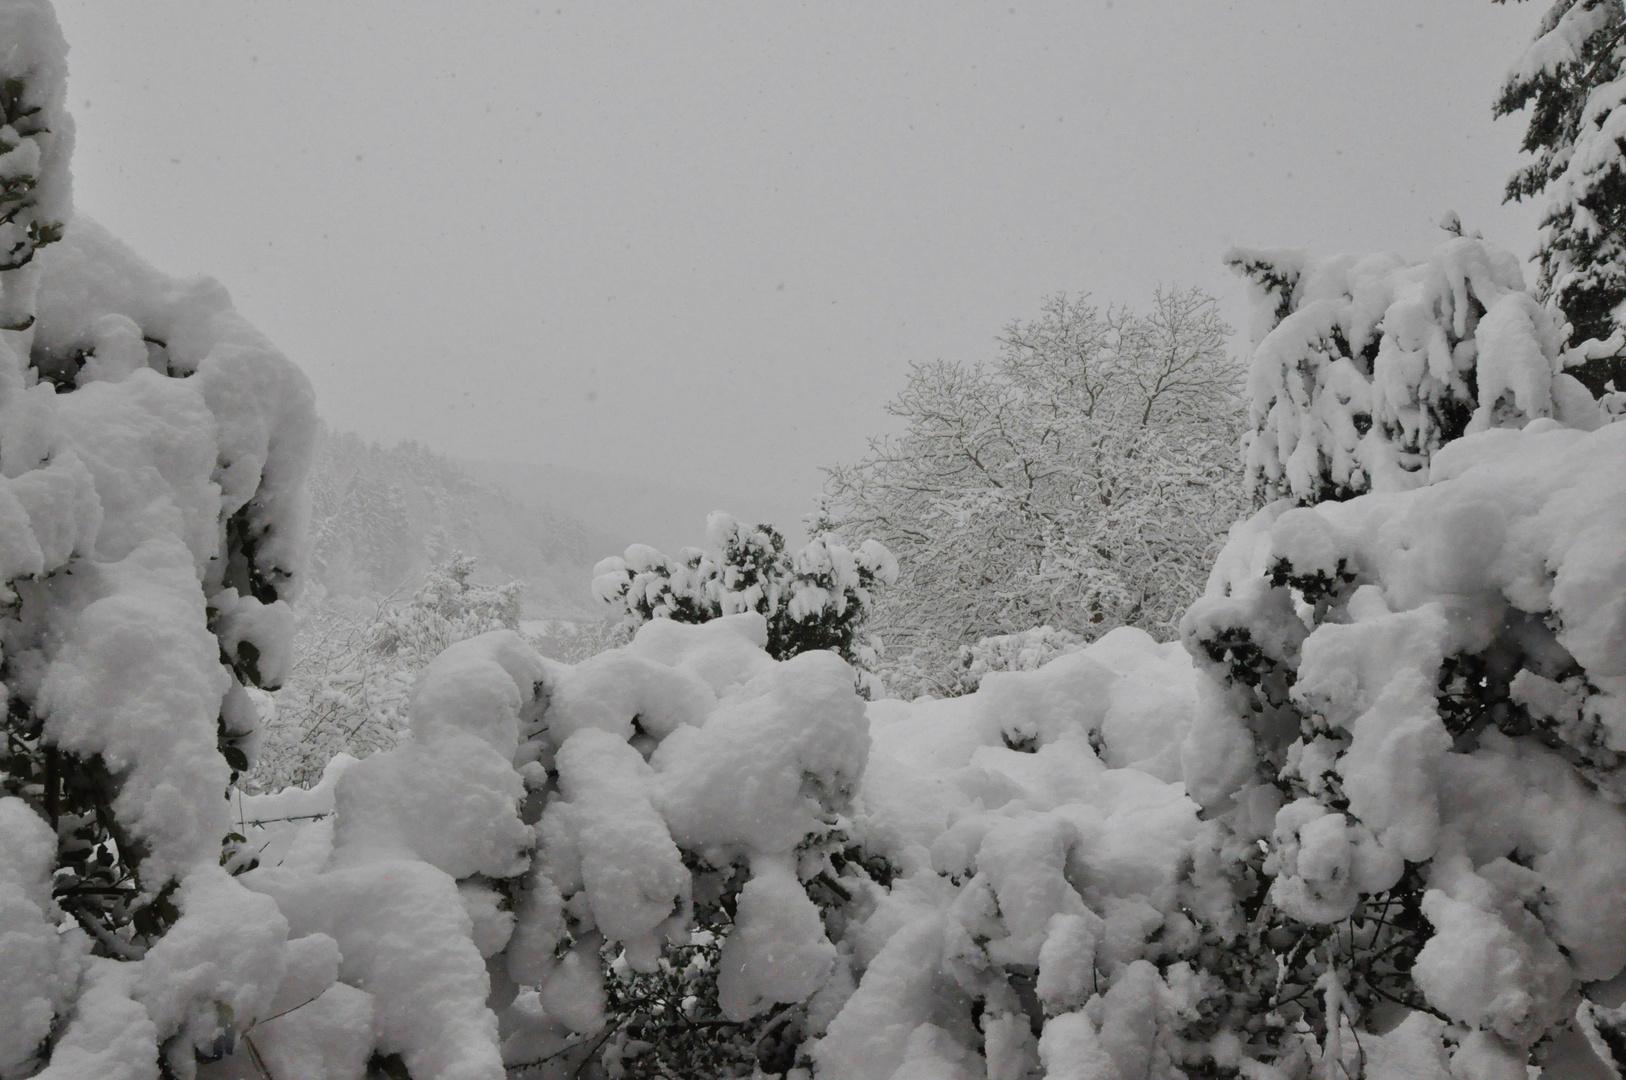 Winterlandschaft 09: Schneefall